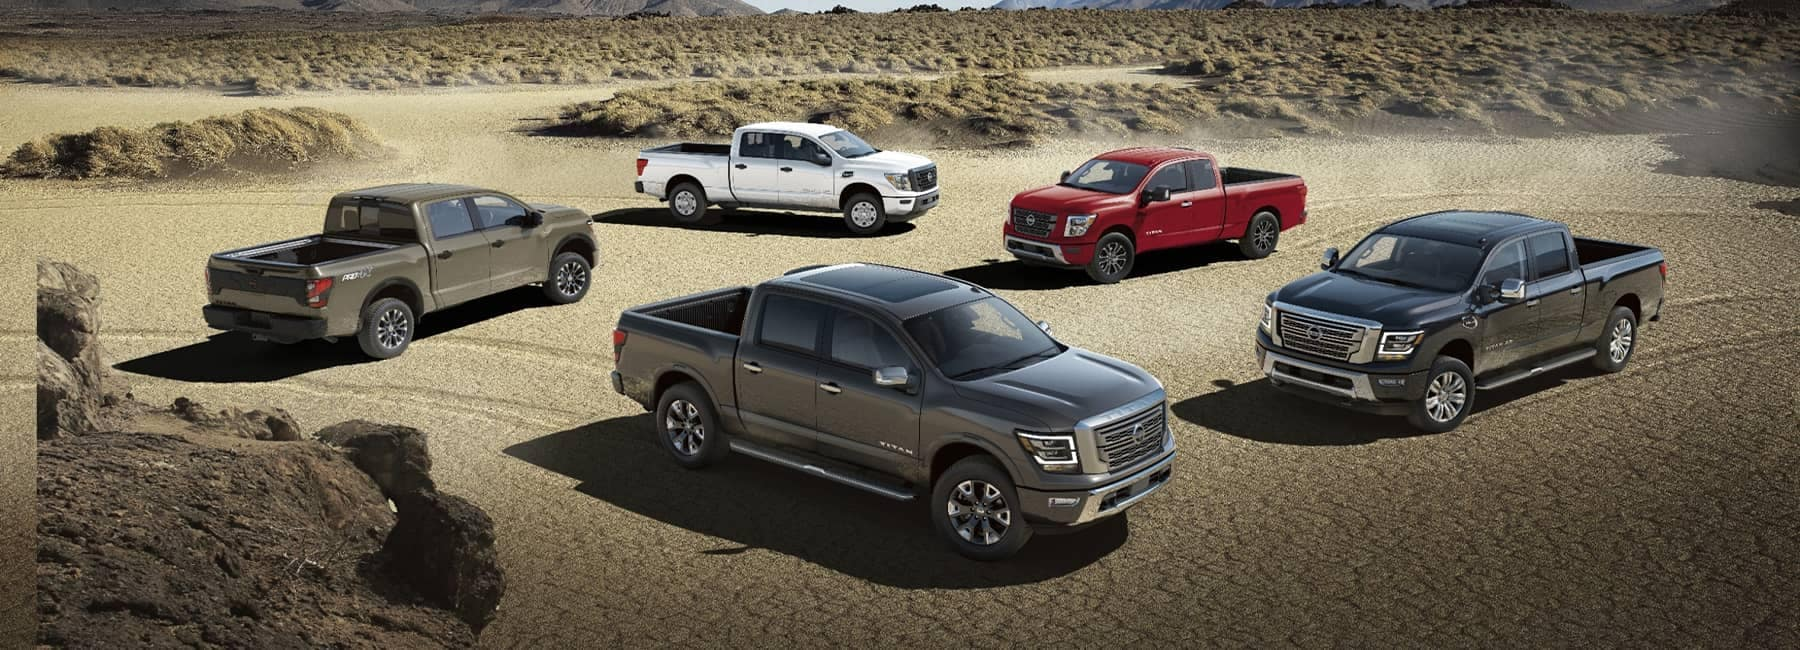 2021 Nissan Titan lineup